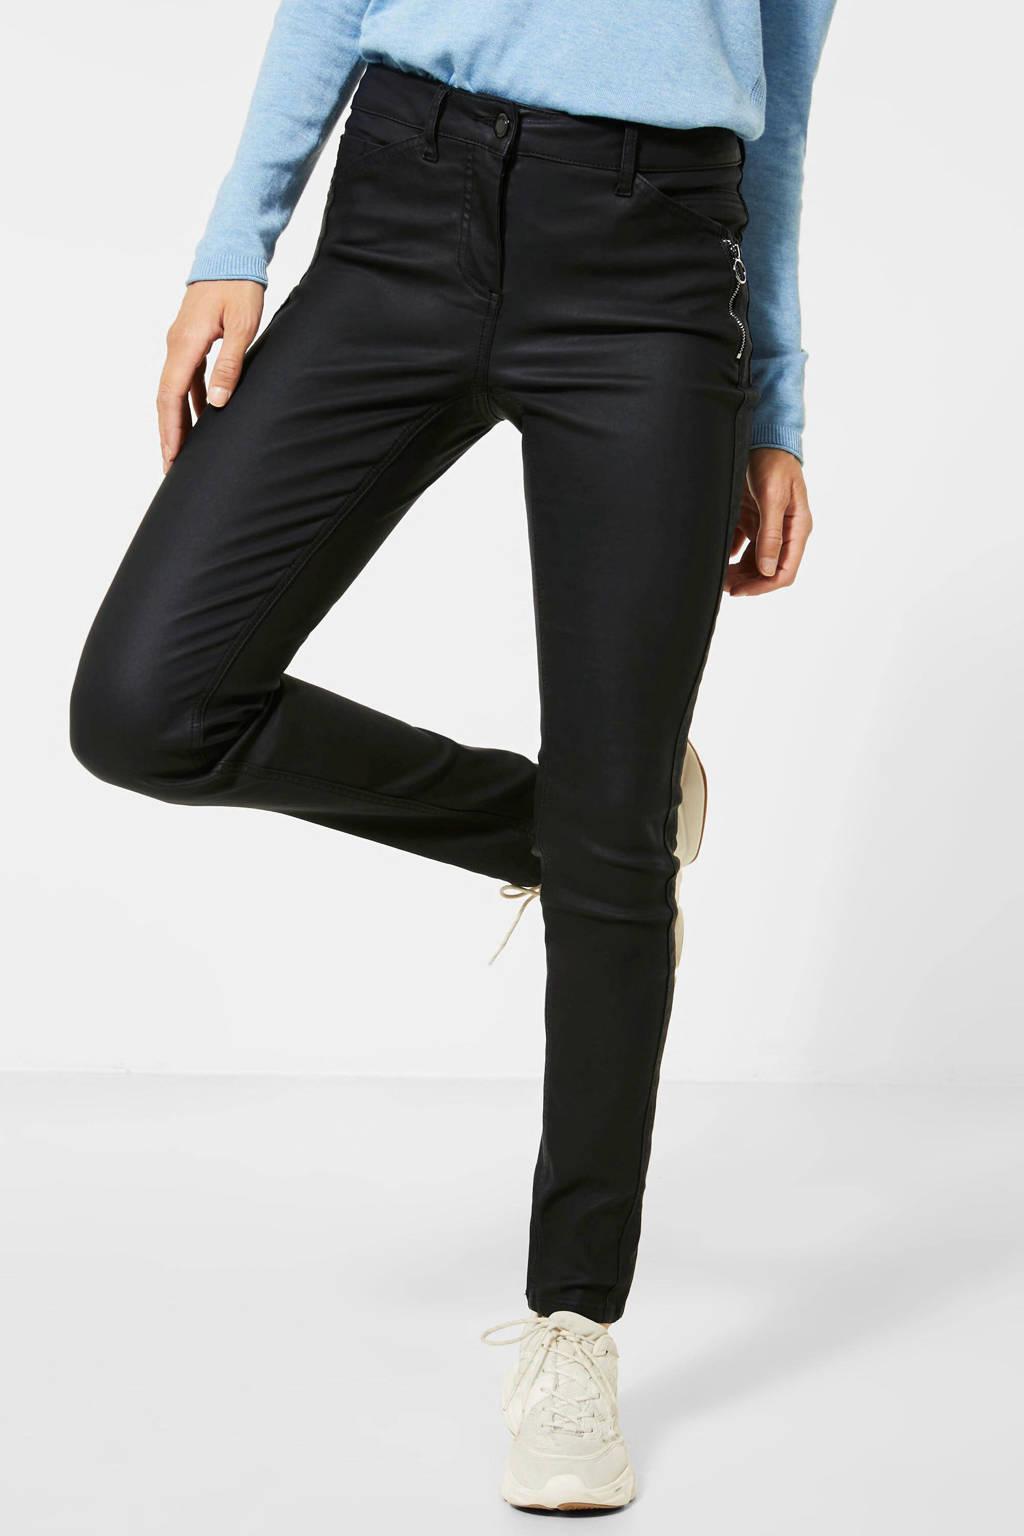 CECIL coated skinny broek Vicky zwart, Zwart